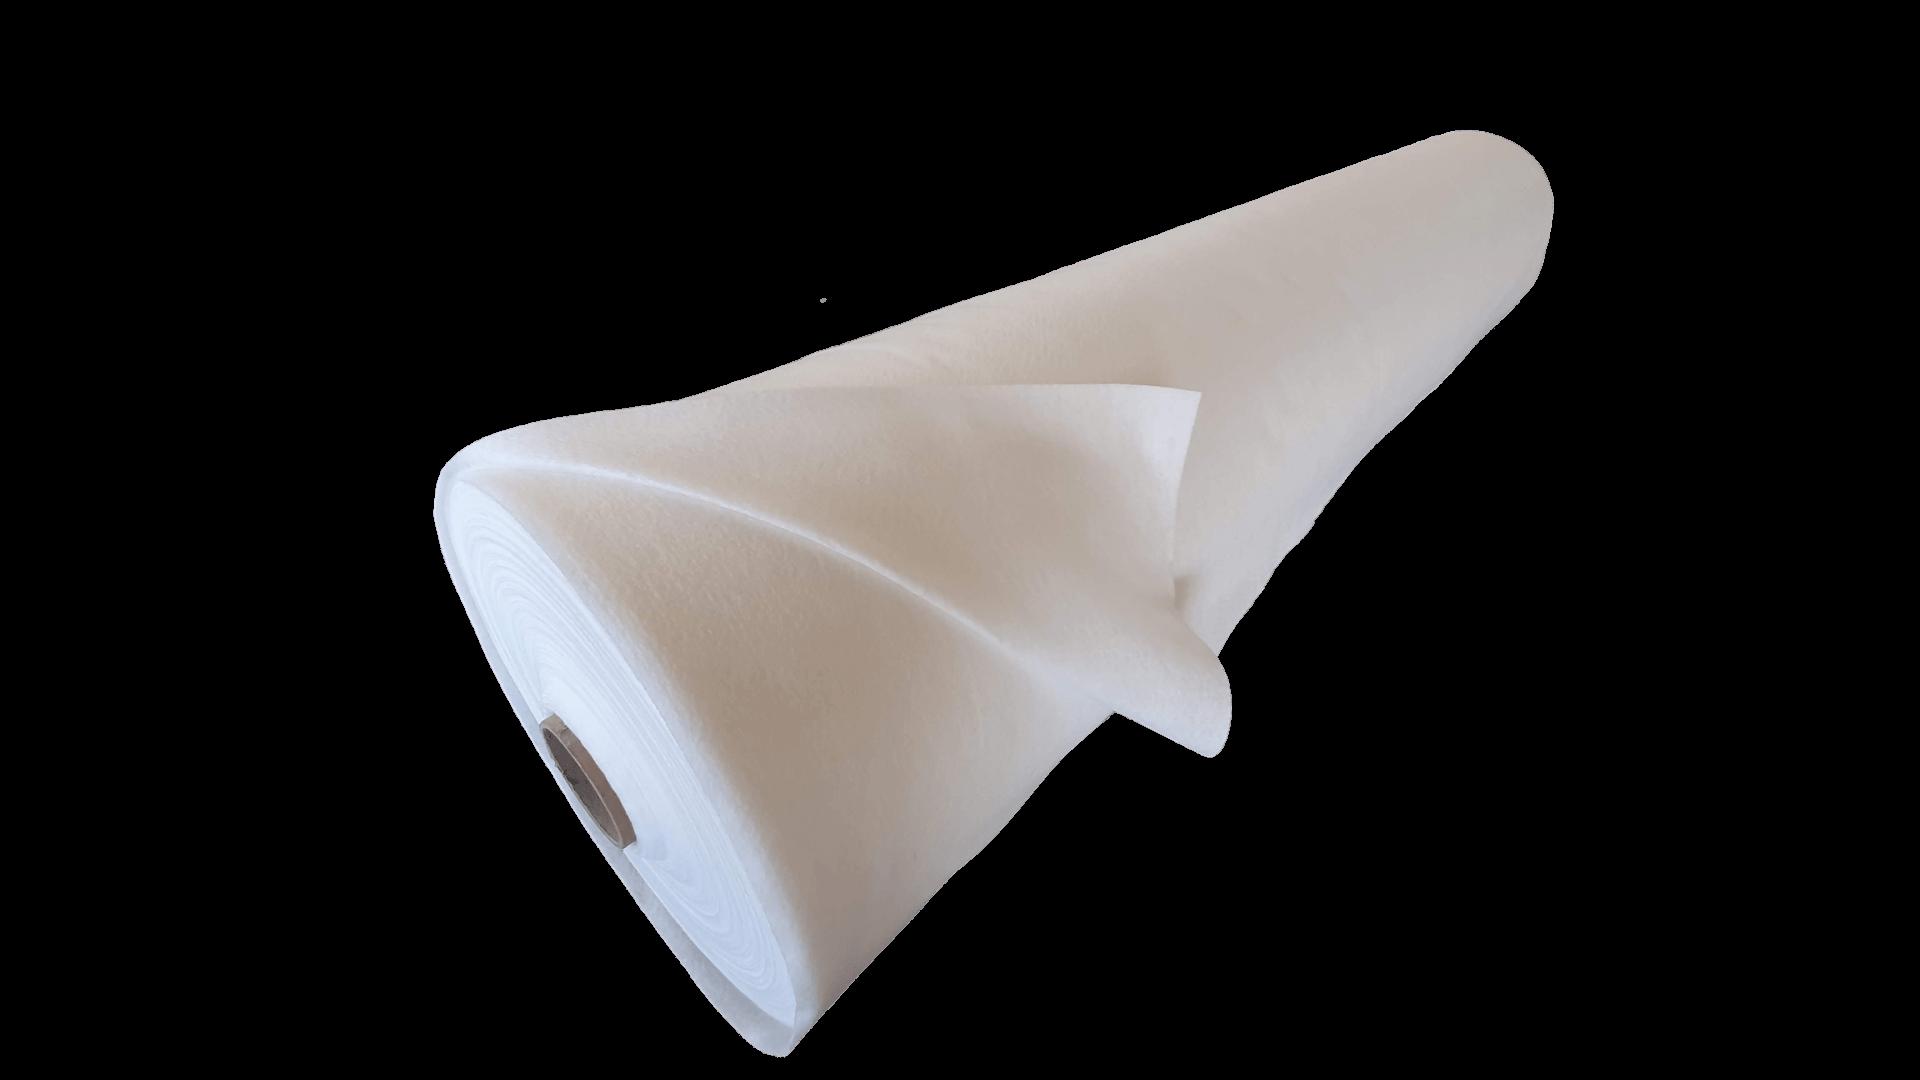 Protectiv hidrofob 110 - material netesut poliester hidrofobizat pentru articole medicale imagine 2021 somnart.ro